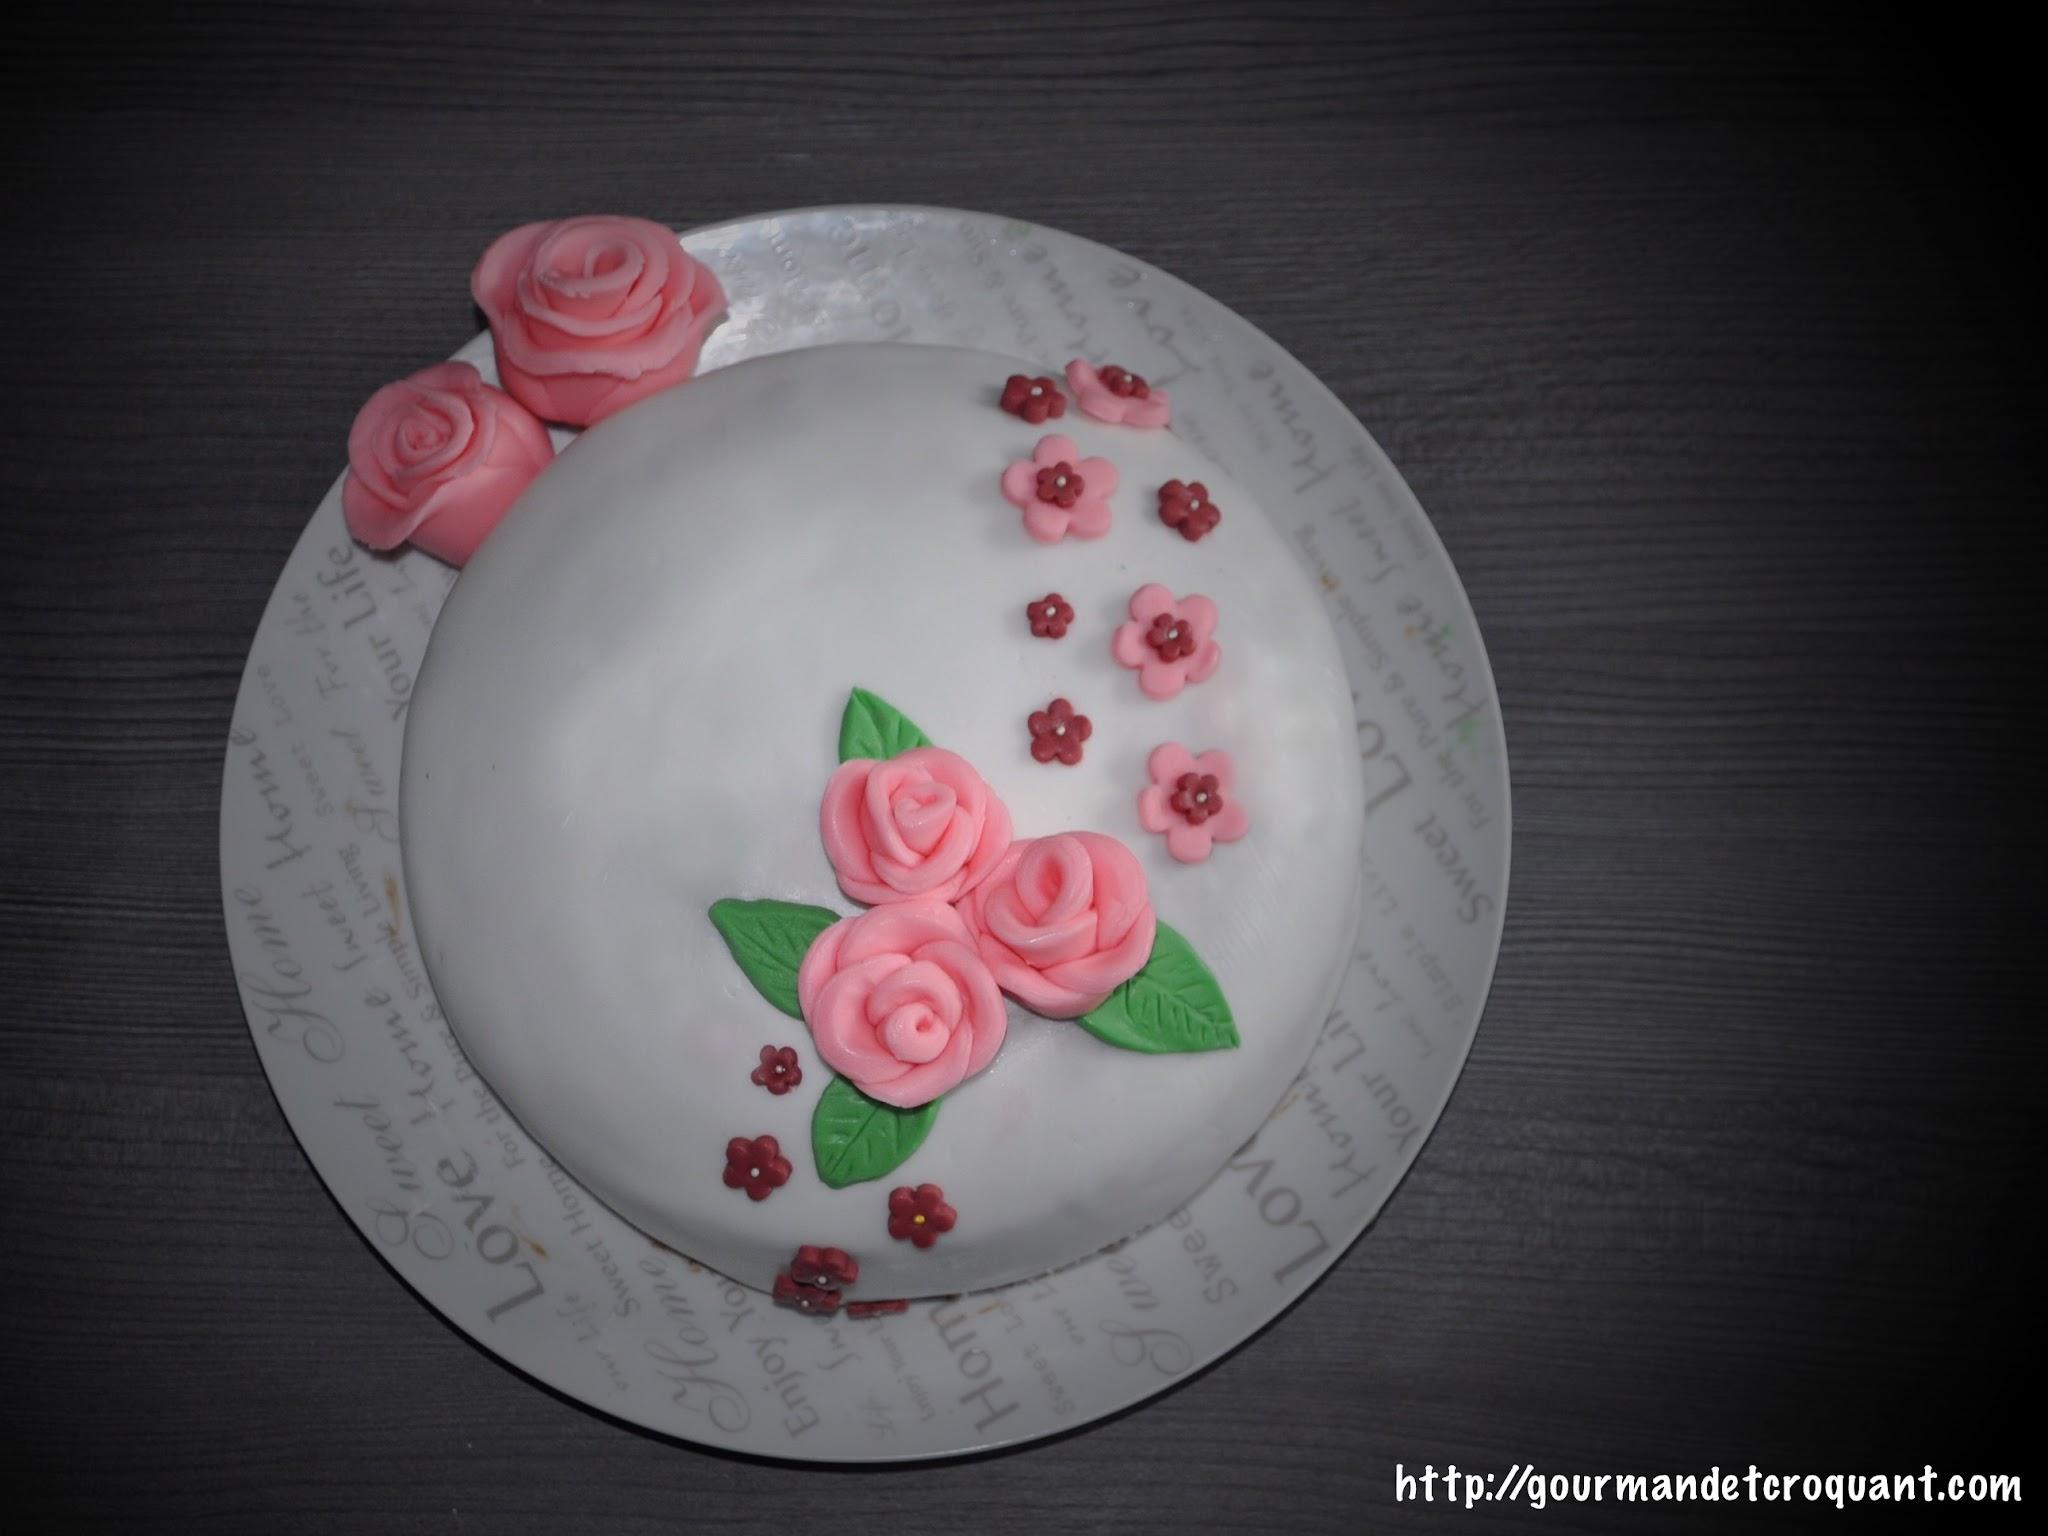 Gourmand Et Croquant Le Madeira Cake Les Bases Du Cake Design